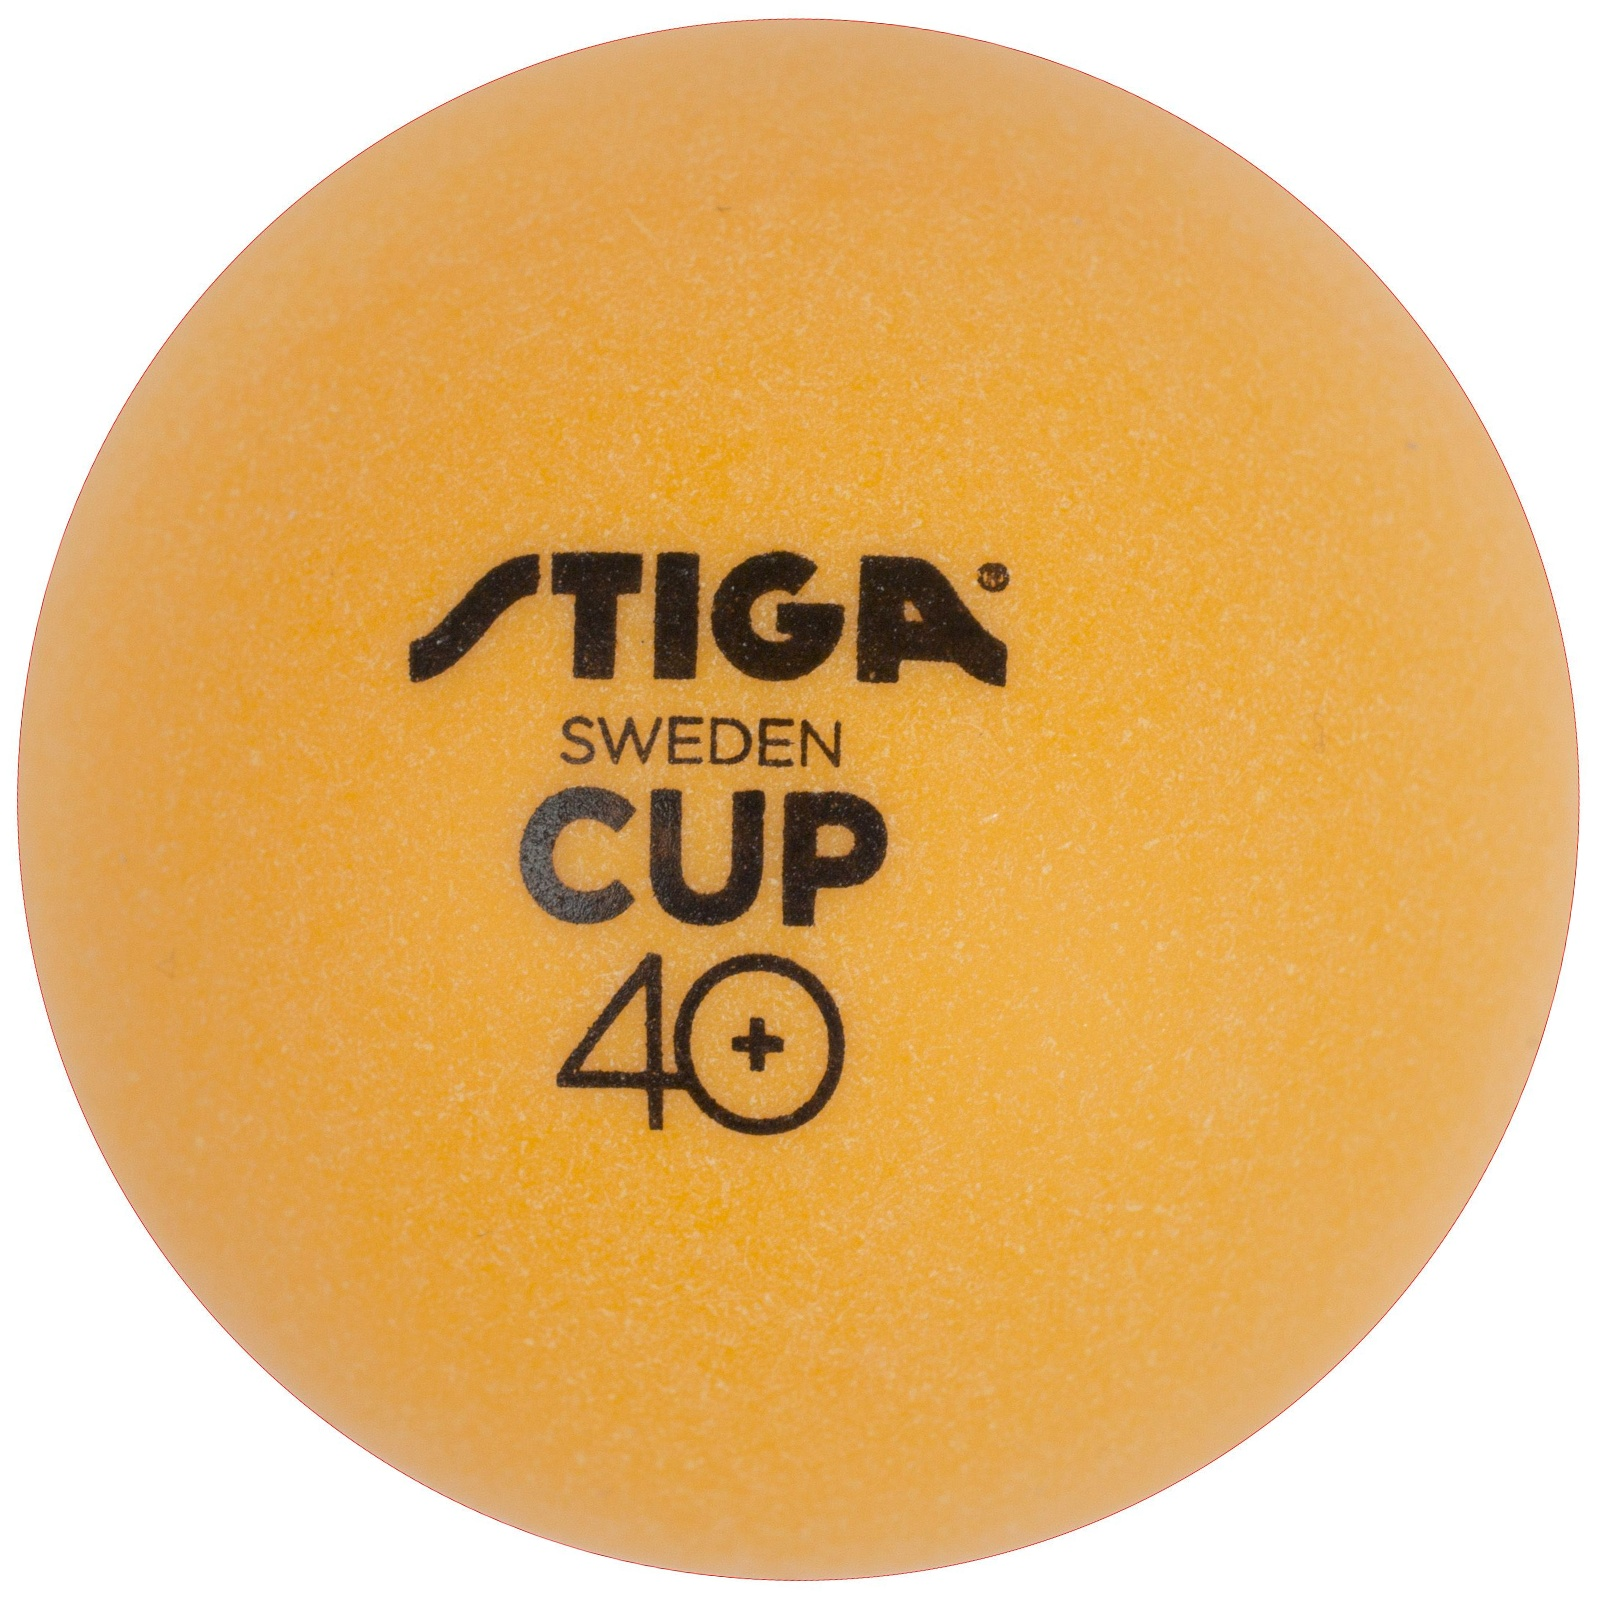 Míčky na stolní tenis STIGA CUP ABS - oranžové 6ks